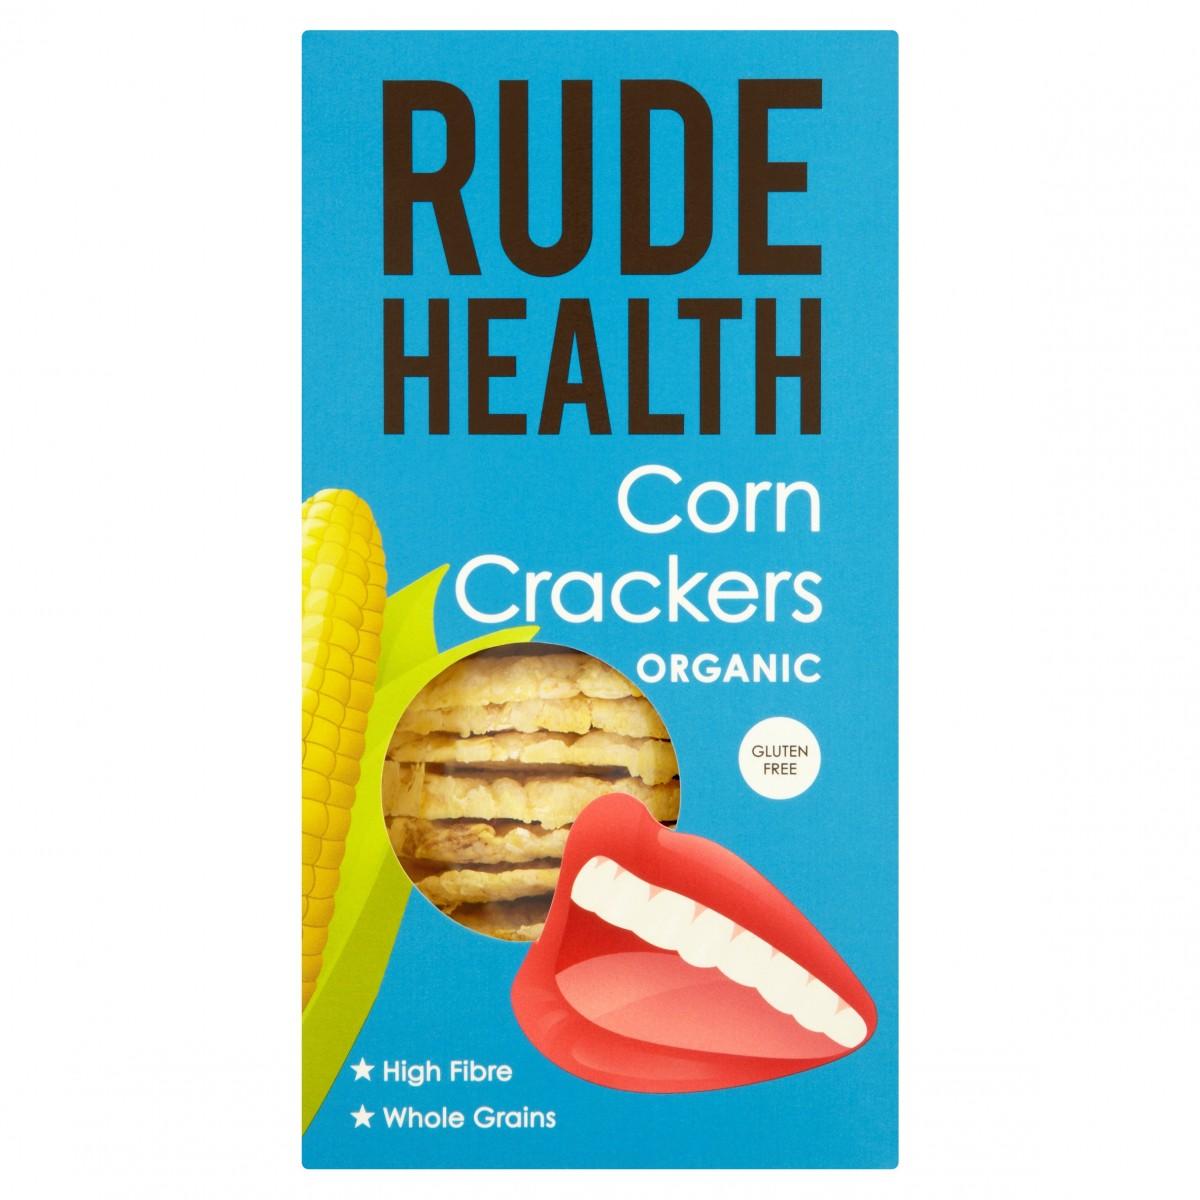 Corn Crackers